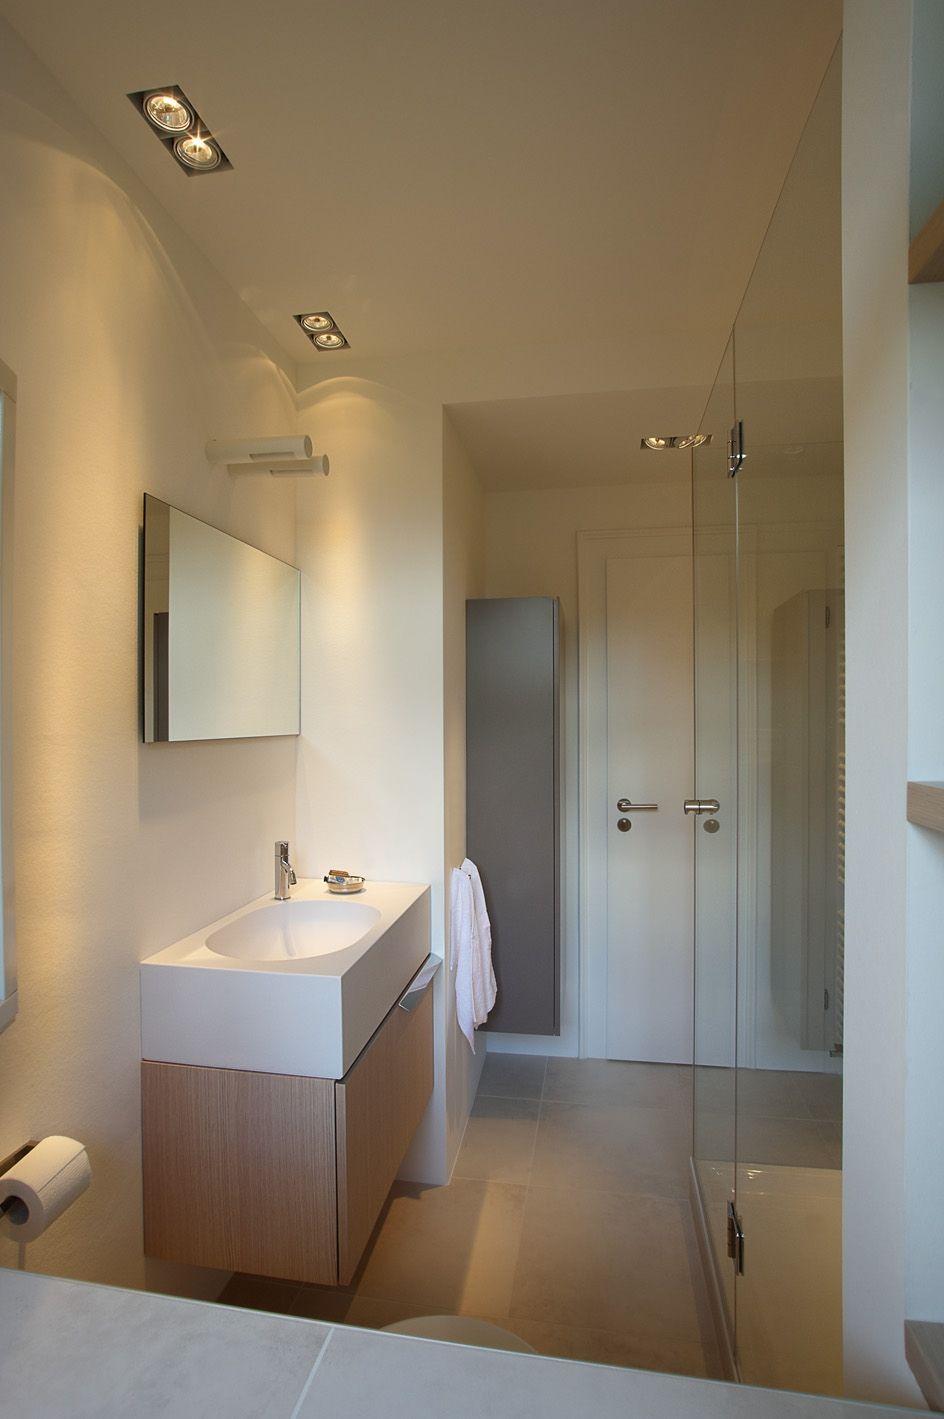 Badezimmer 4 6 Qm